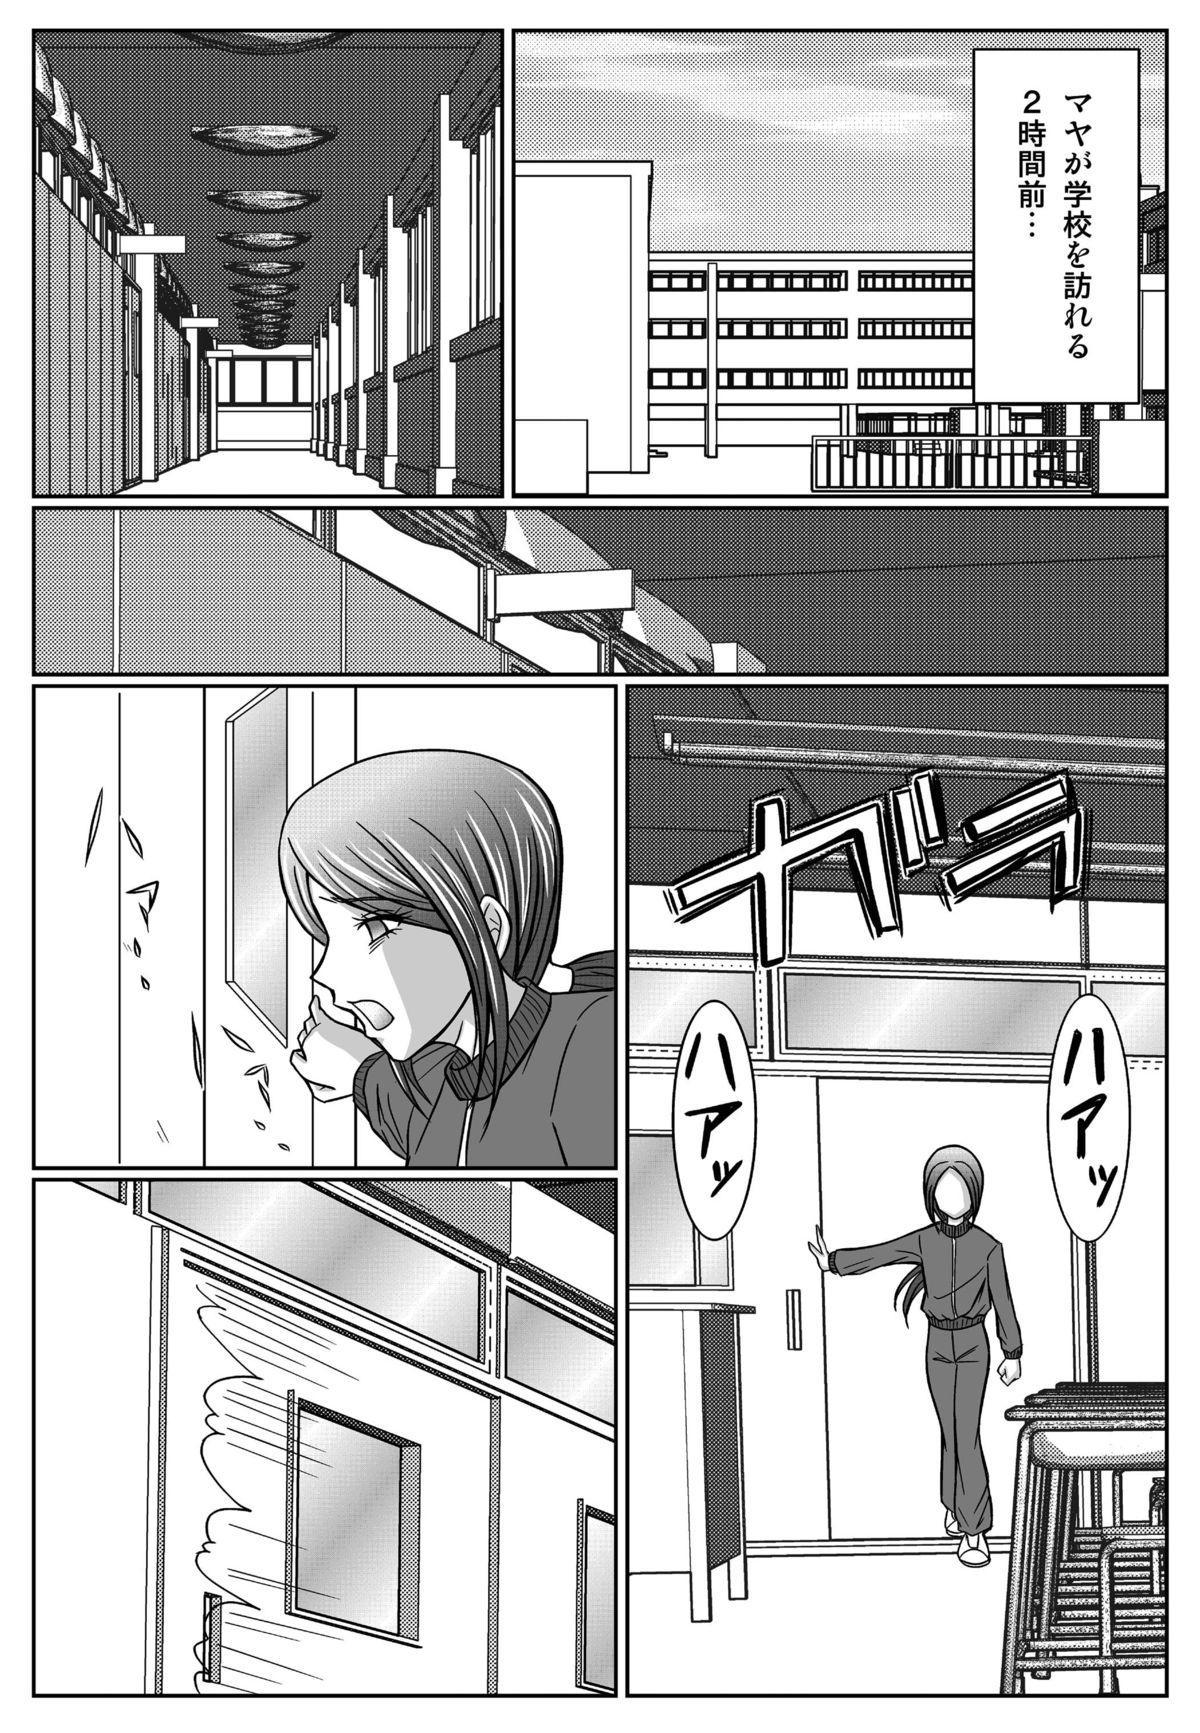 [Macxe's (monmon)] Tokubousentai Dinaranger ~Heroine Kairaku Sennou Keikaku~ Vol.01/02/03 (Renkaban) [Digital] 91